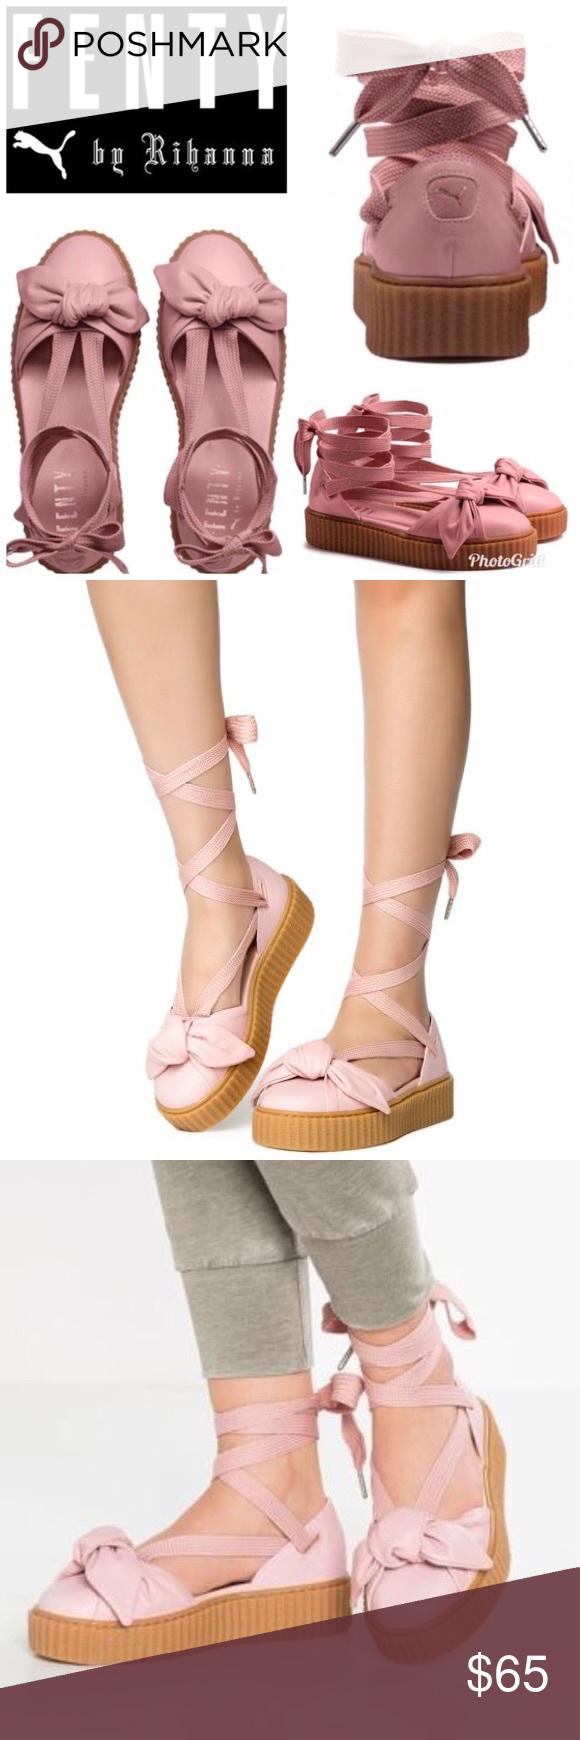 af62b2e4a6bf Puma Fenty Bow Creeper NWT. No Box. Rihanna Fenty Puma Creepers Lace Up  Tie  Up Sandals. Sneakers. Espadrilles. Platform soles. Pink   Blush Color. Puma  ...